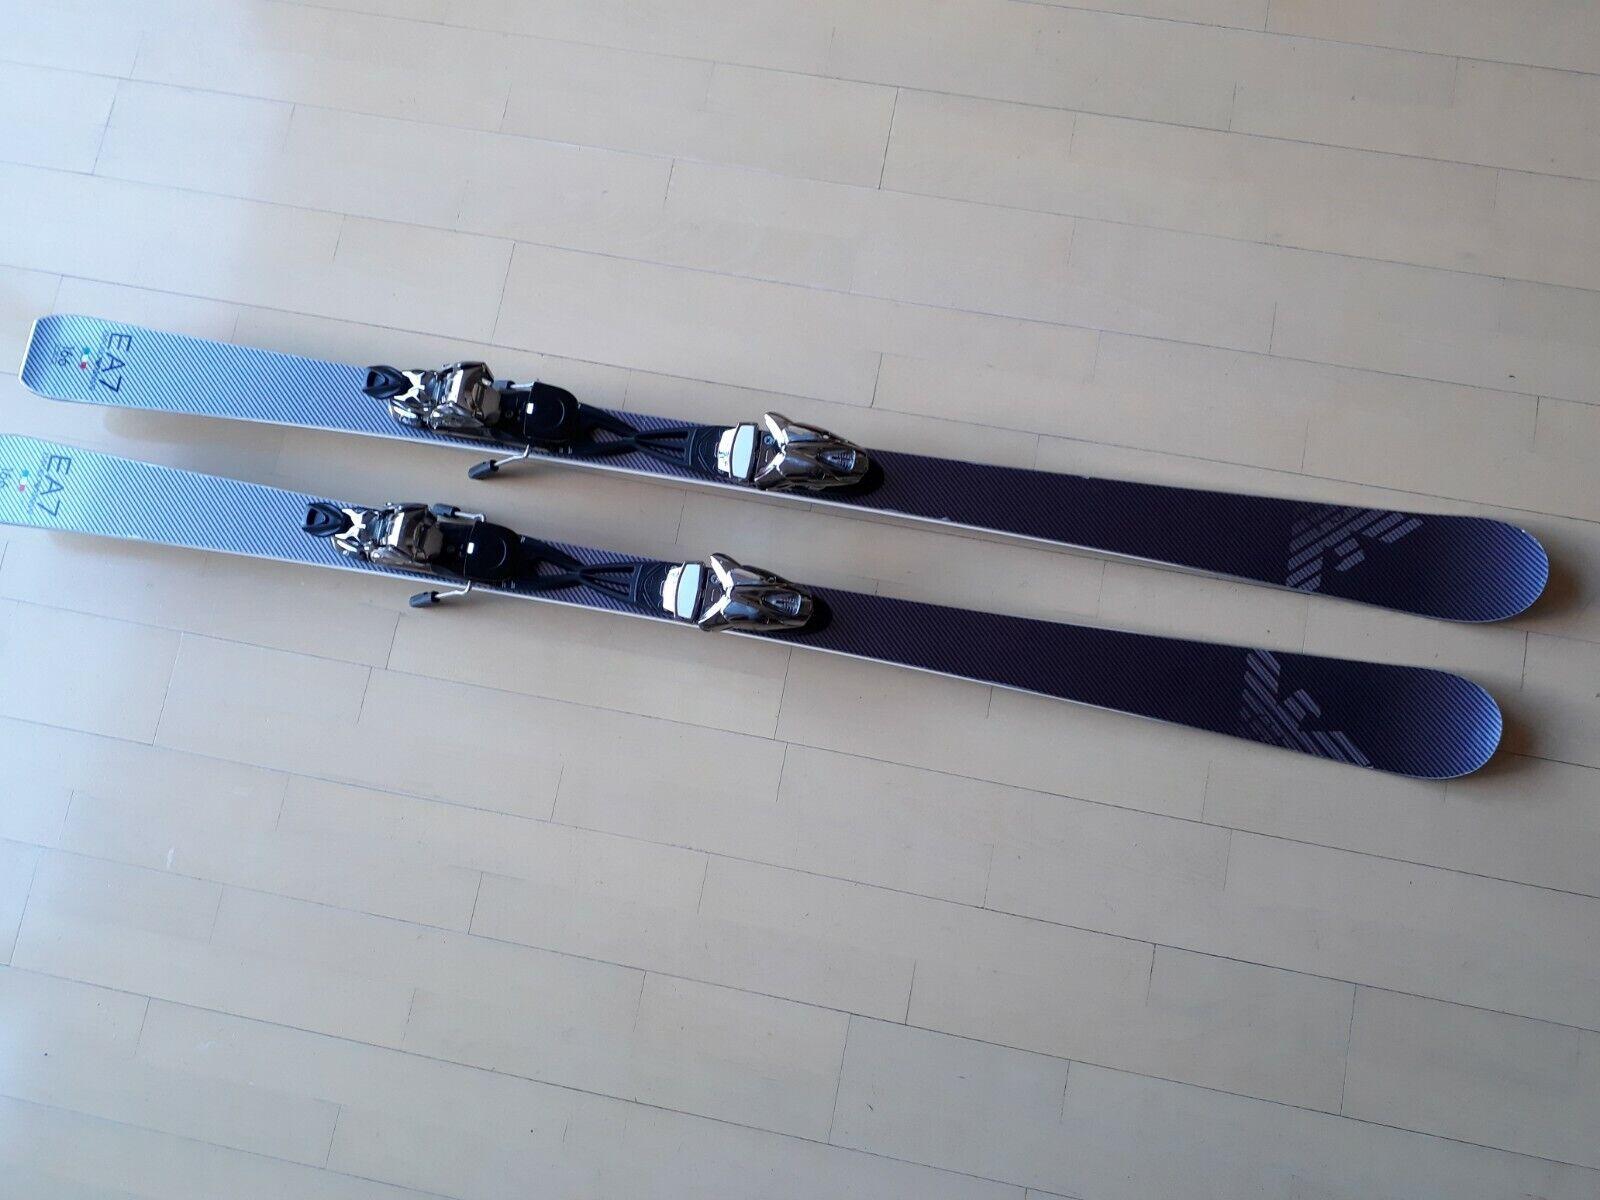 Armani Carving Skis from Emporio Armani Bond Street London 166cm RRP